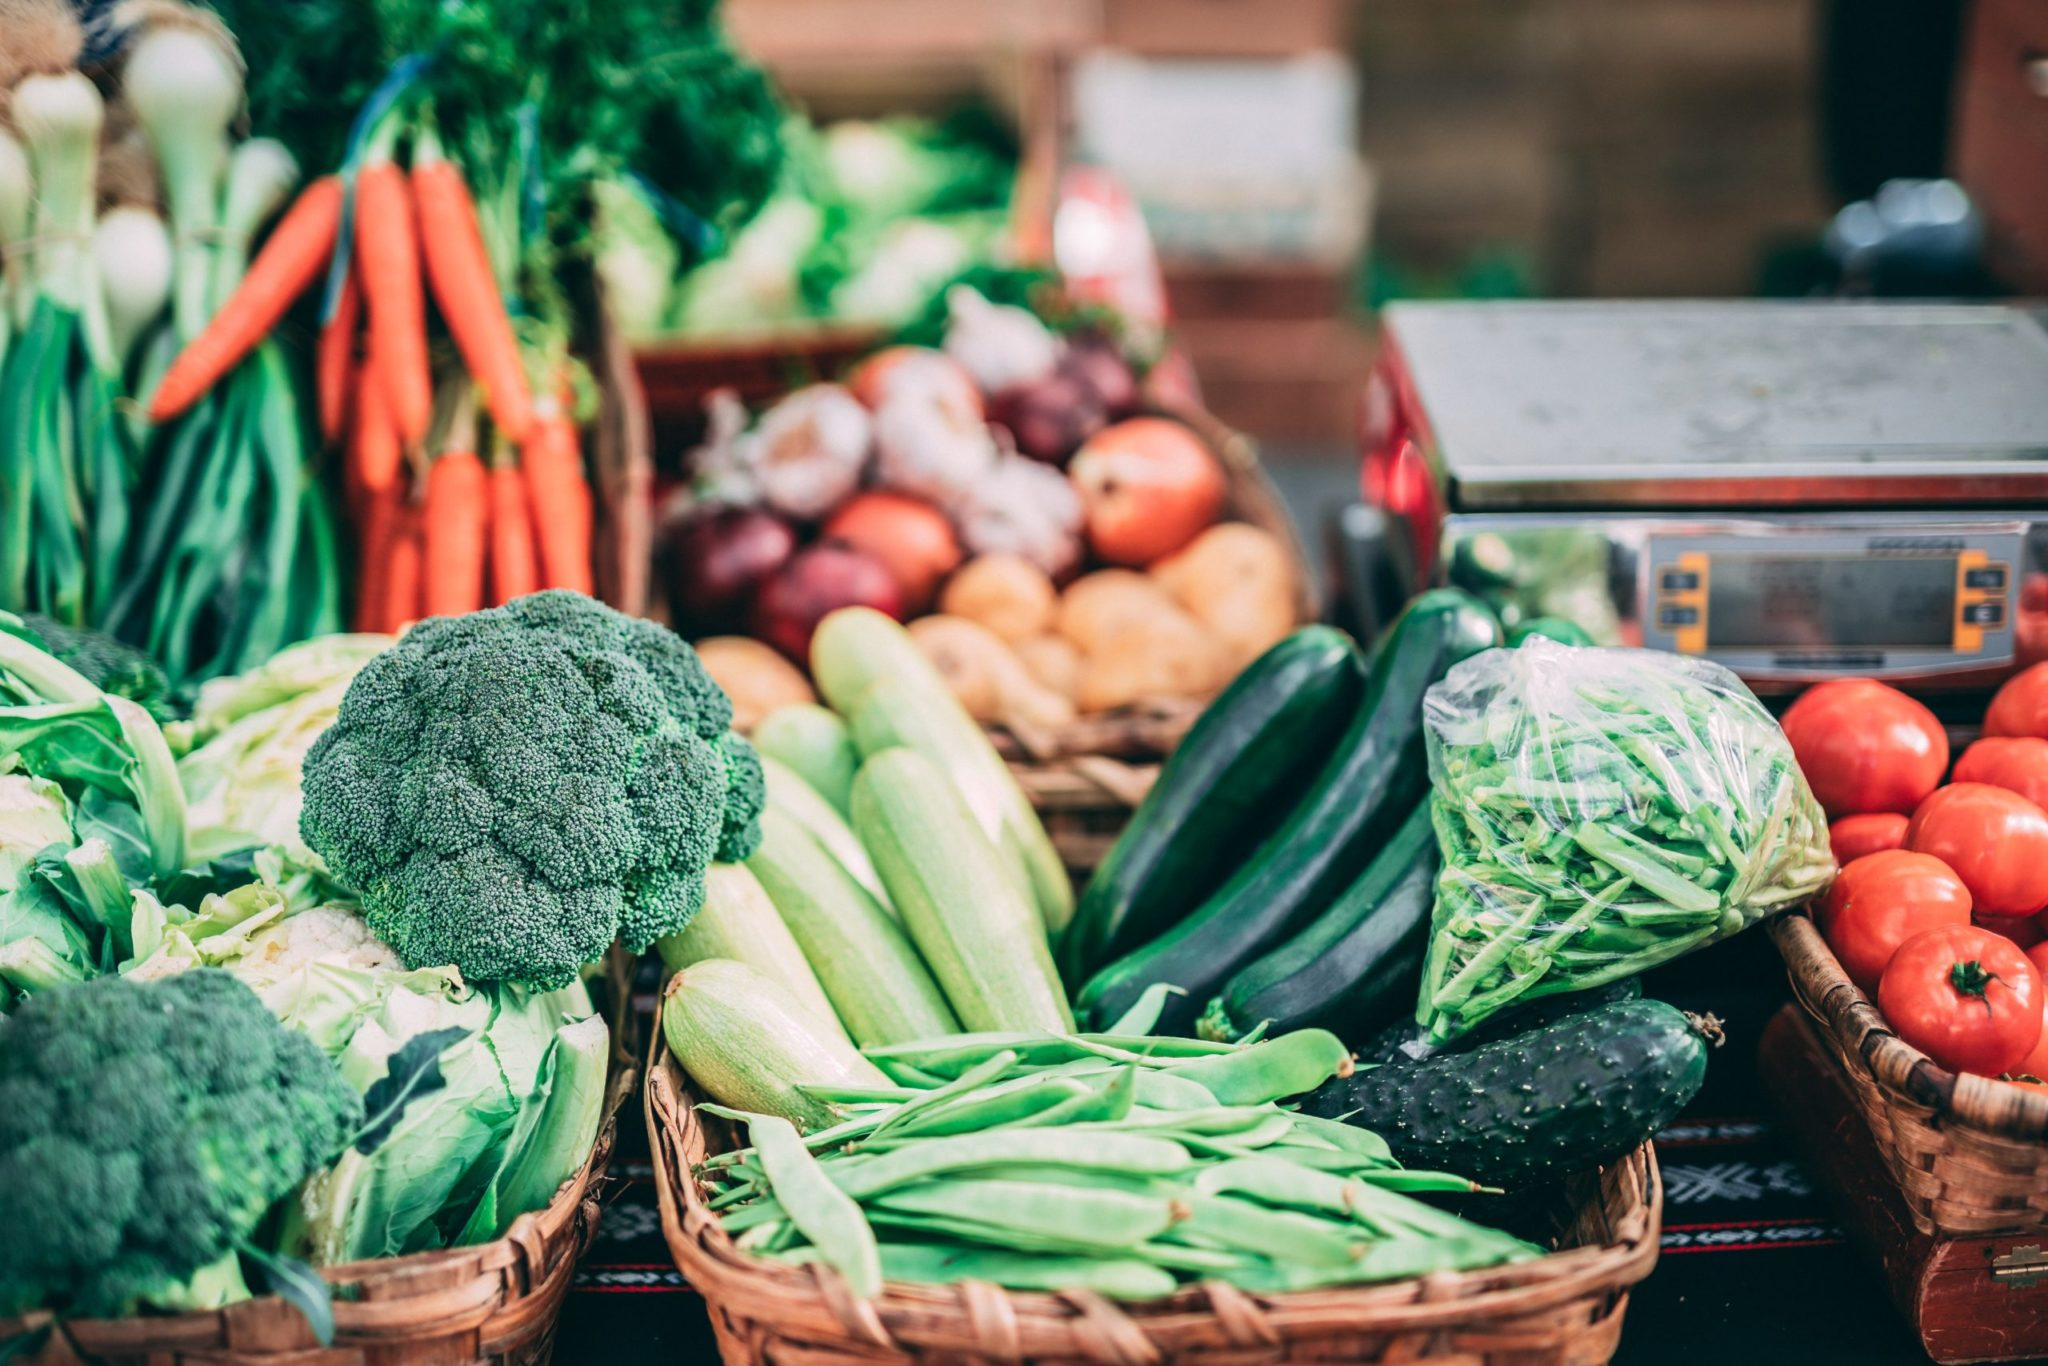 vegetables, How Backyard Veggies Beat the Supermarket, Best Garden, Home And DIY Tips